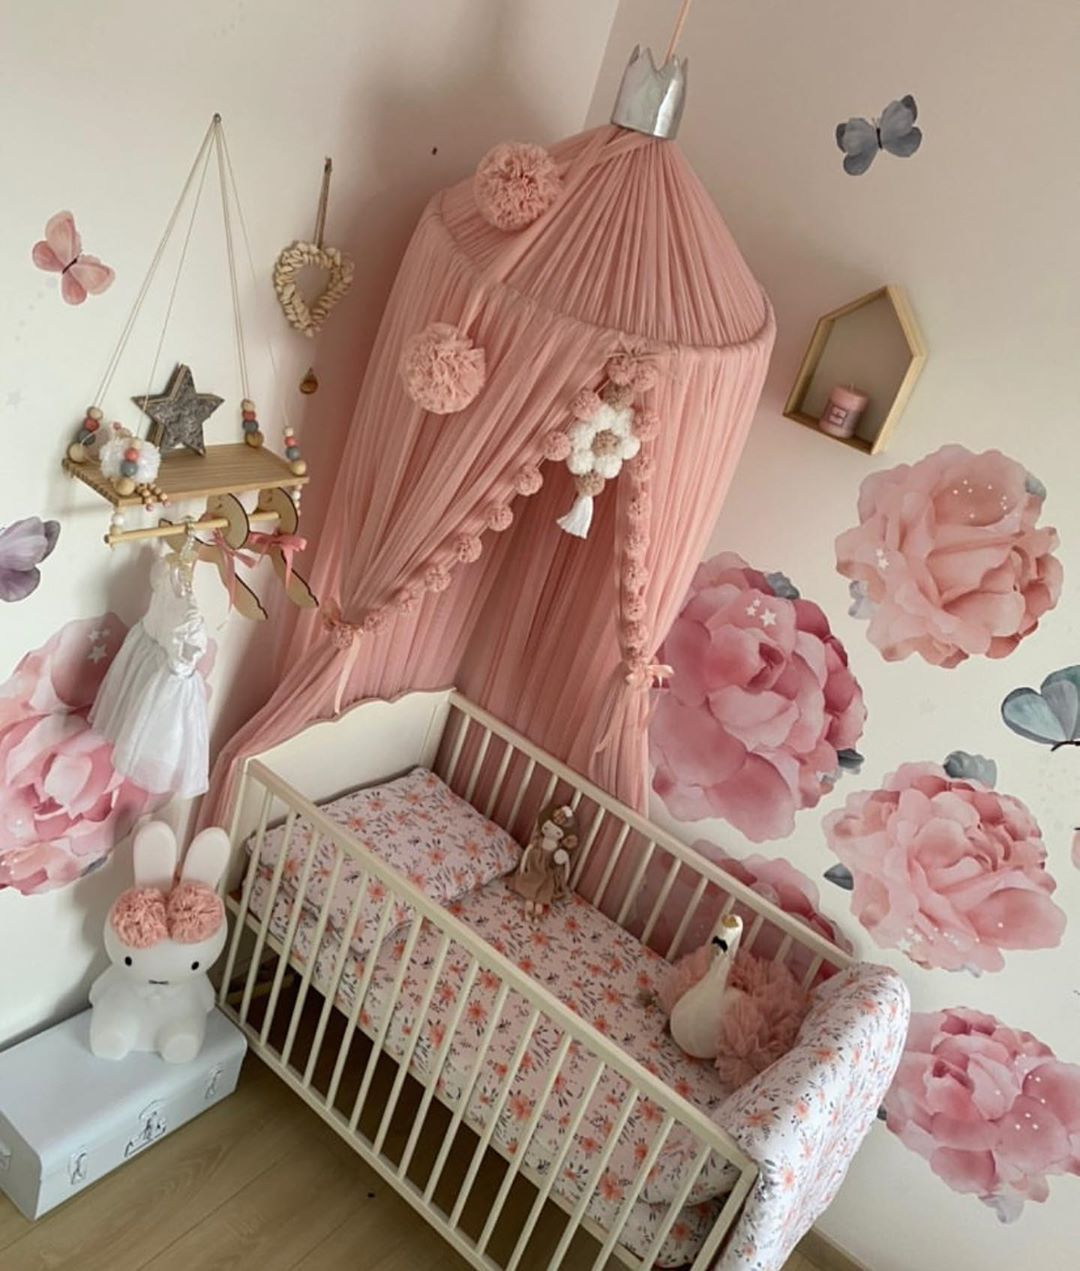 ▪️Kids Room 👶🏼 LOVE 😍 @sorbana_printh  #instagood #instalike #likephoto #picoftheday #chambrebebe #babygirl #babyroom #amazingworld #passiondeco #decoration #deco #decorationinterieur #homedecor #homesweethome #interiordesign #tendance2017 #playground #interior123 #lovelyinterior #design #decoenfant #kidsdecor #maisondumonde #zen #relax #plush  #scandinavian #scandinaviandesign